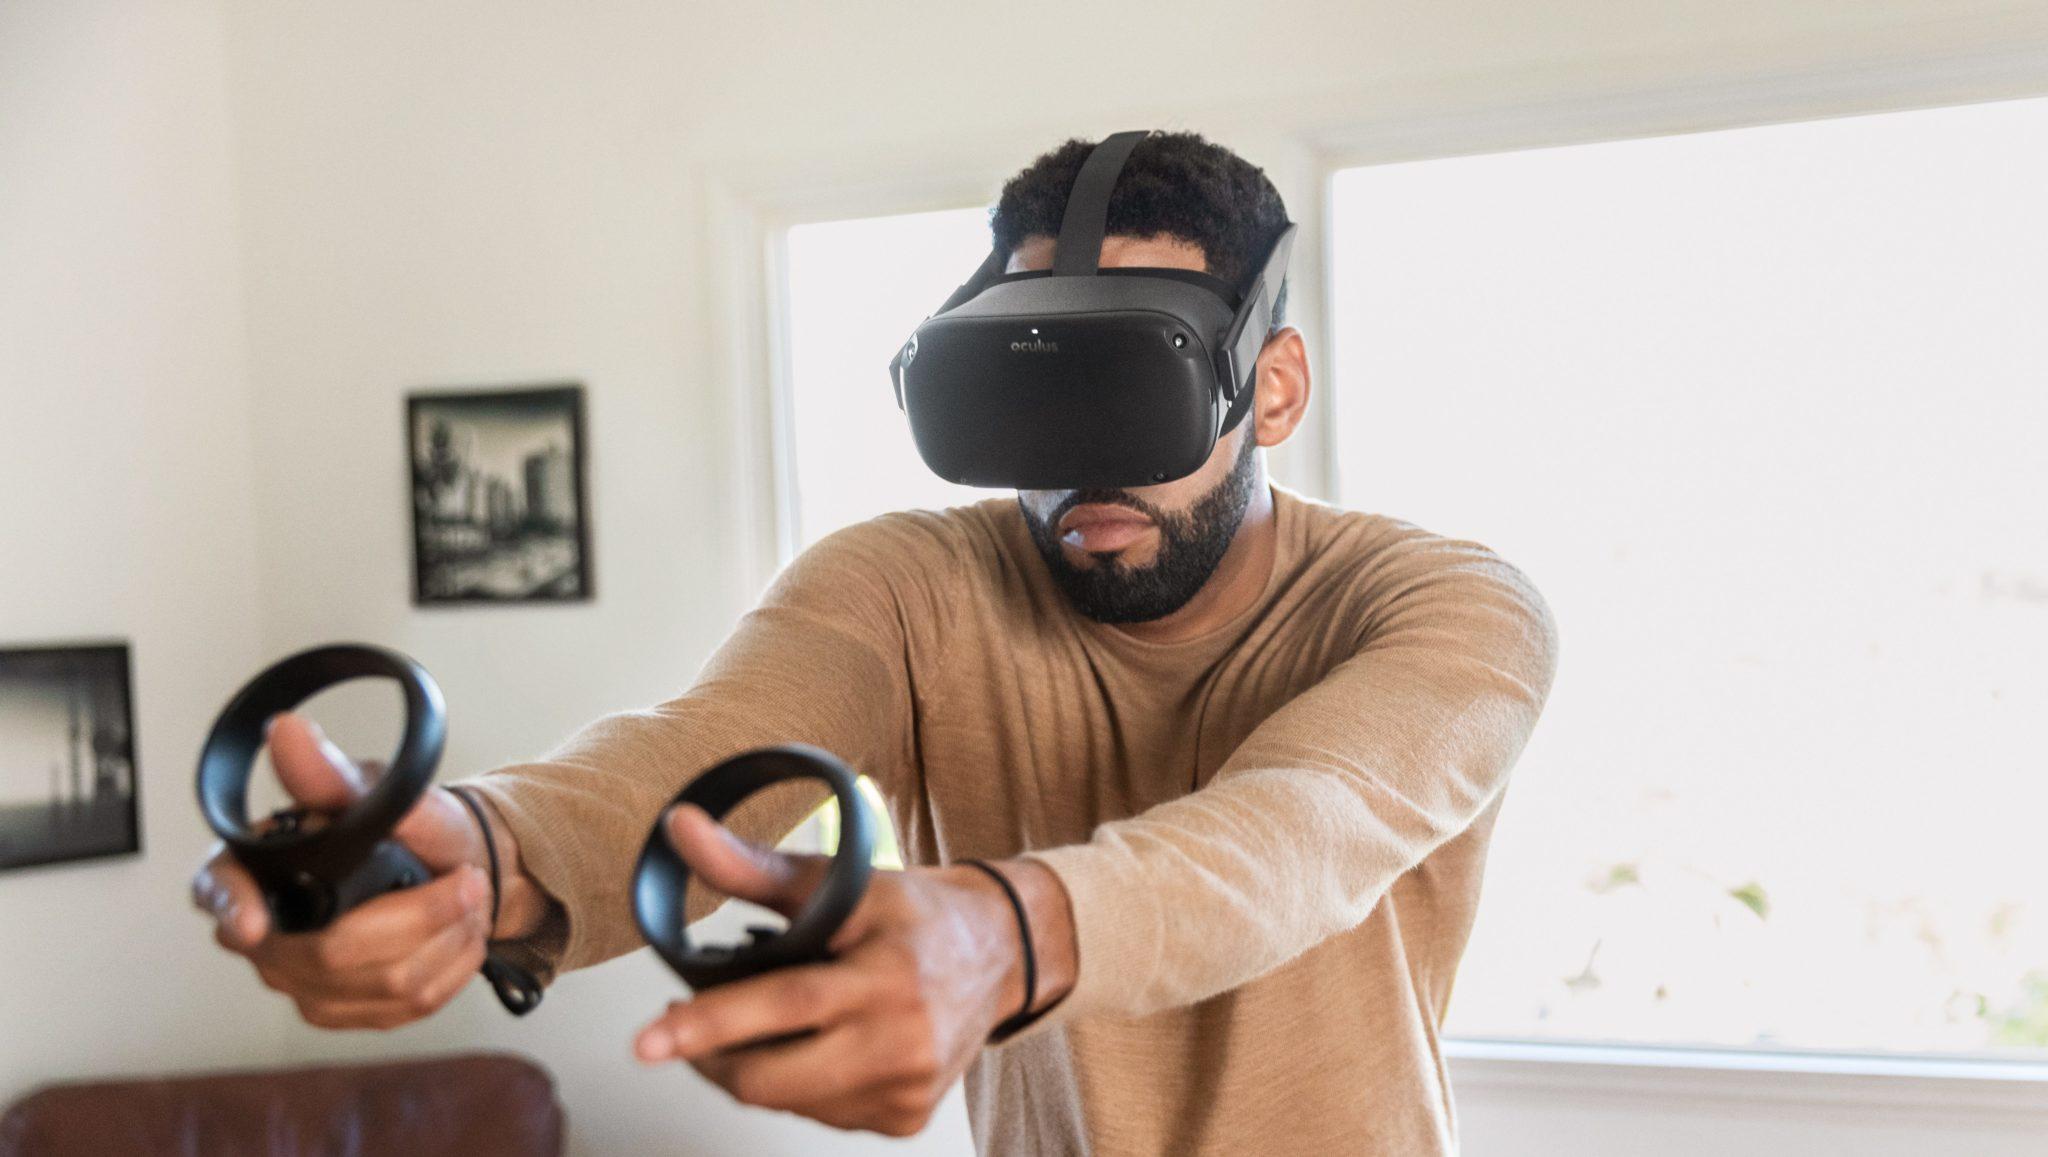 Ofertas de aniversario en Oculus Quest